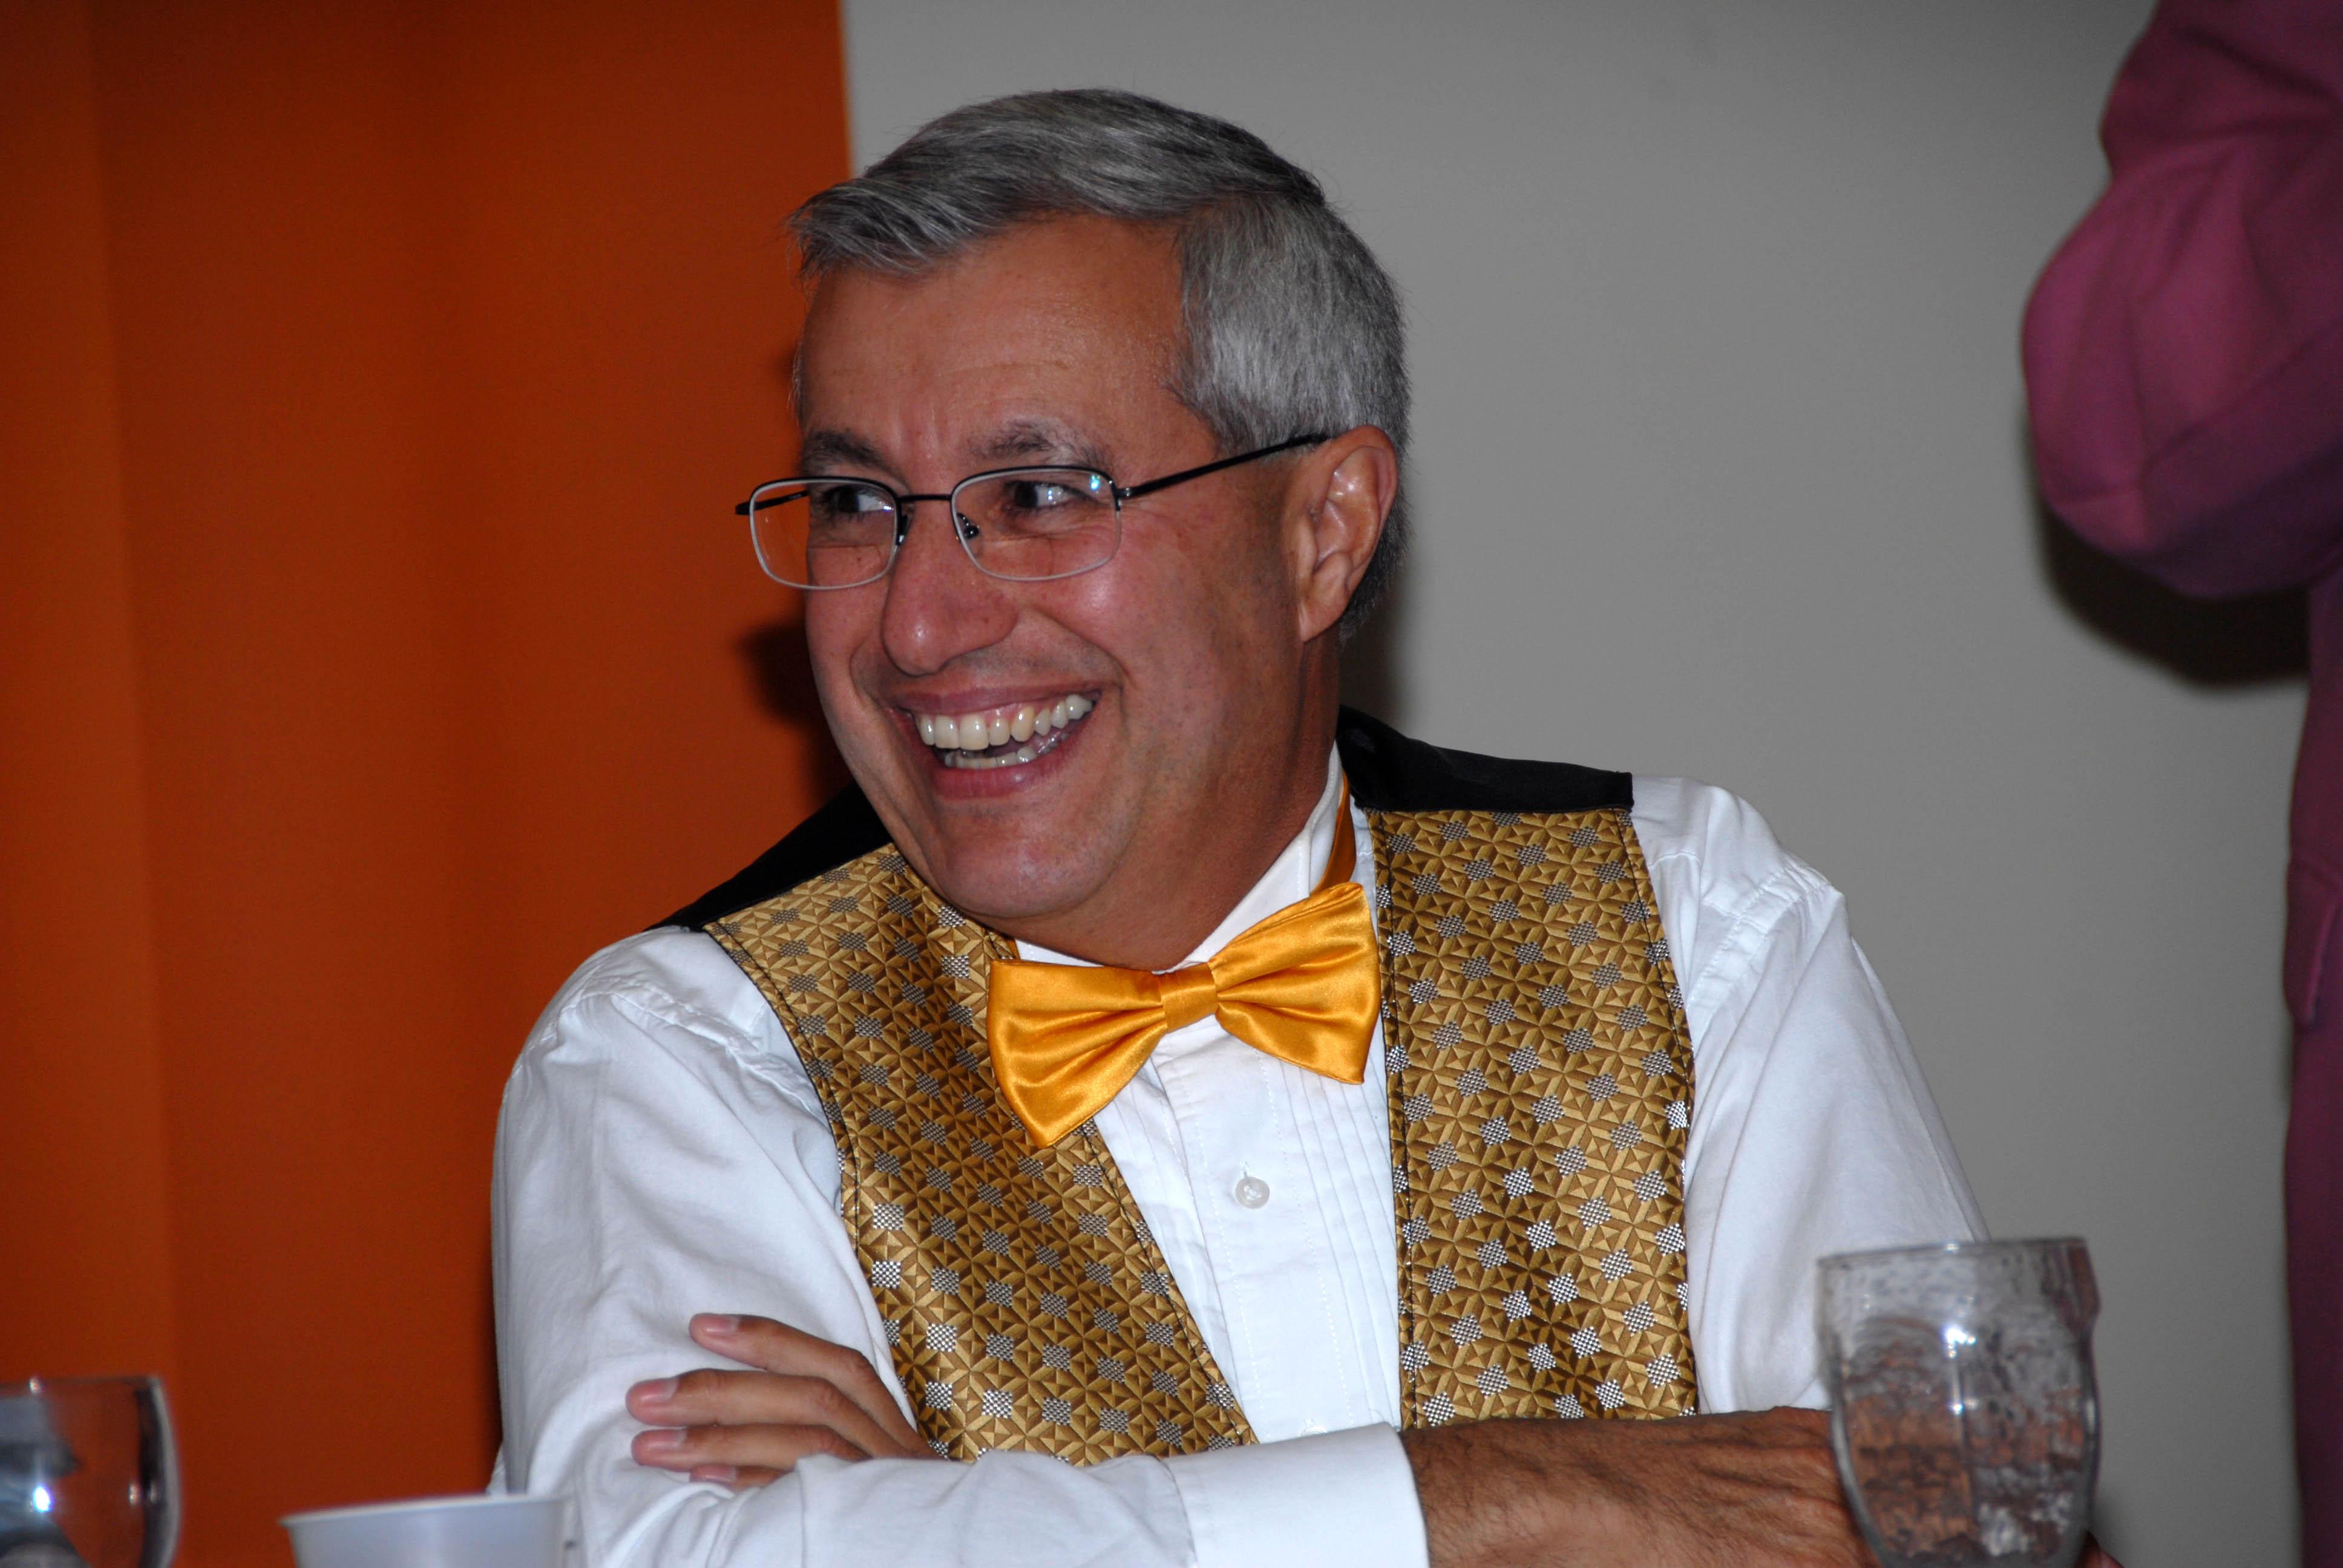 Ontario MPP Vic Fedeli in his trademark